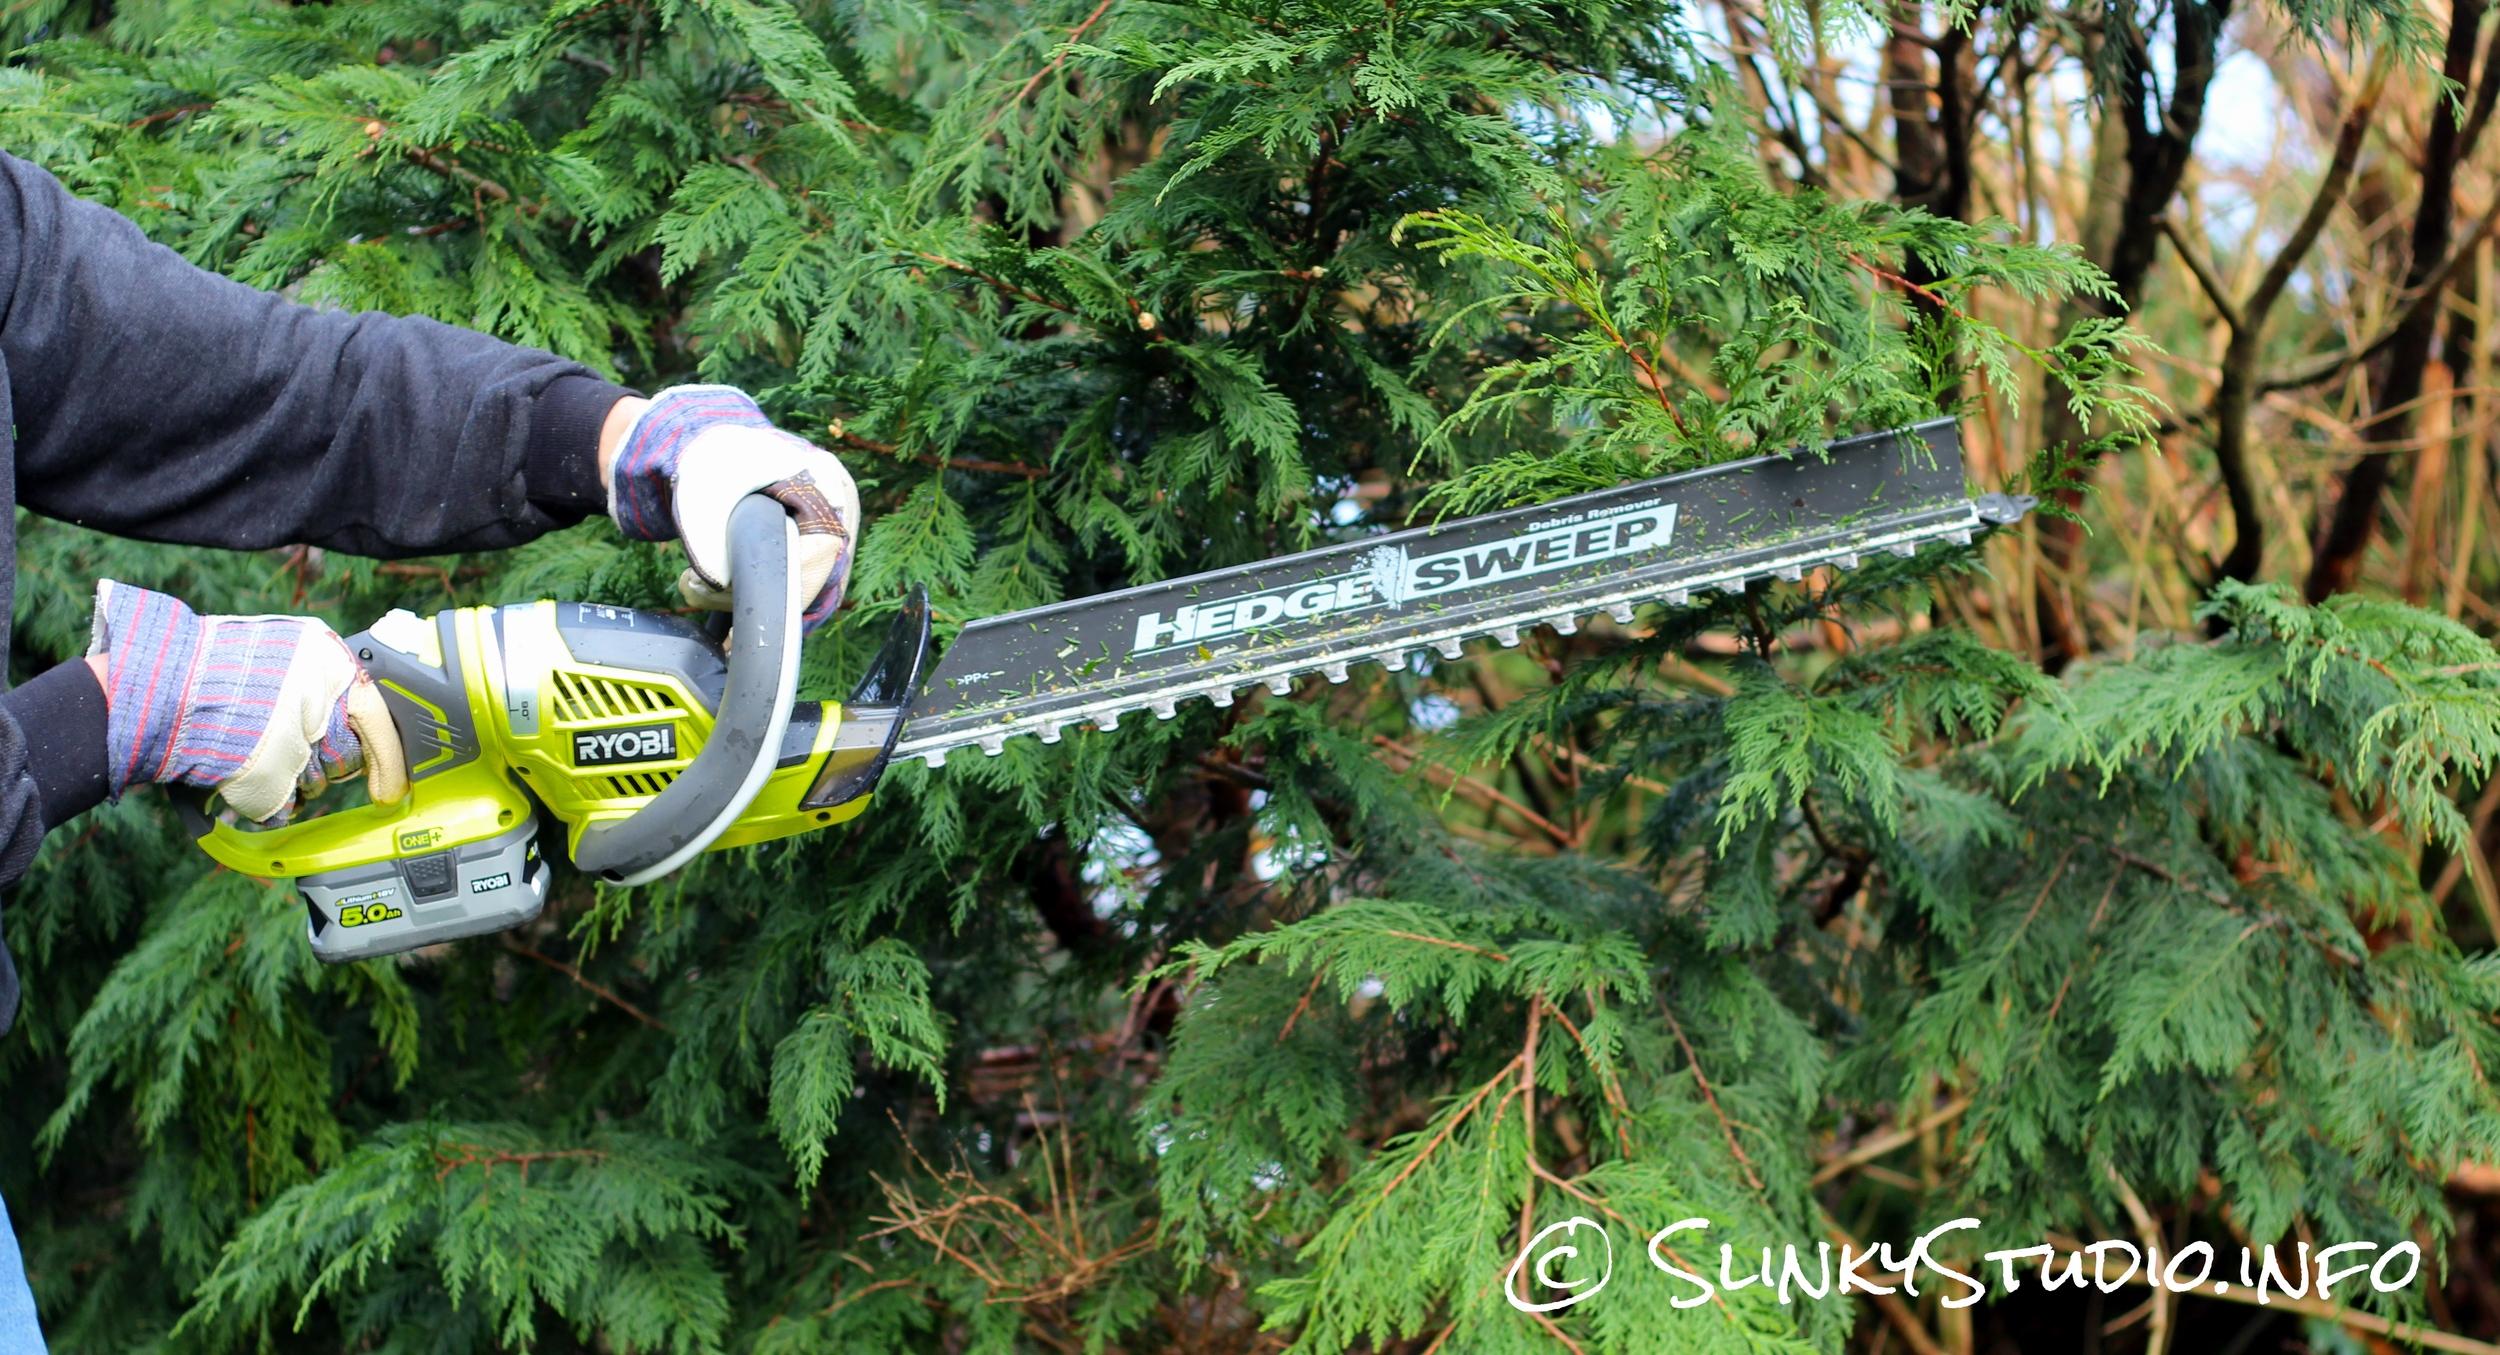 Ryobi One+ Hedge Trimmer Cutting Tree Greenery.jpg